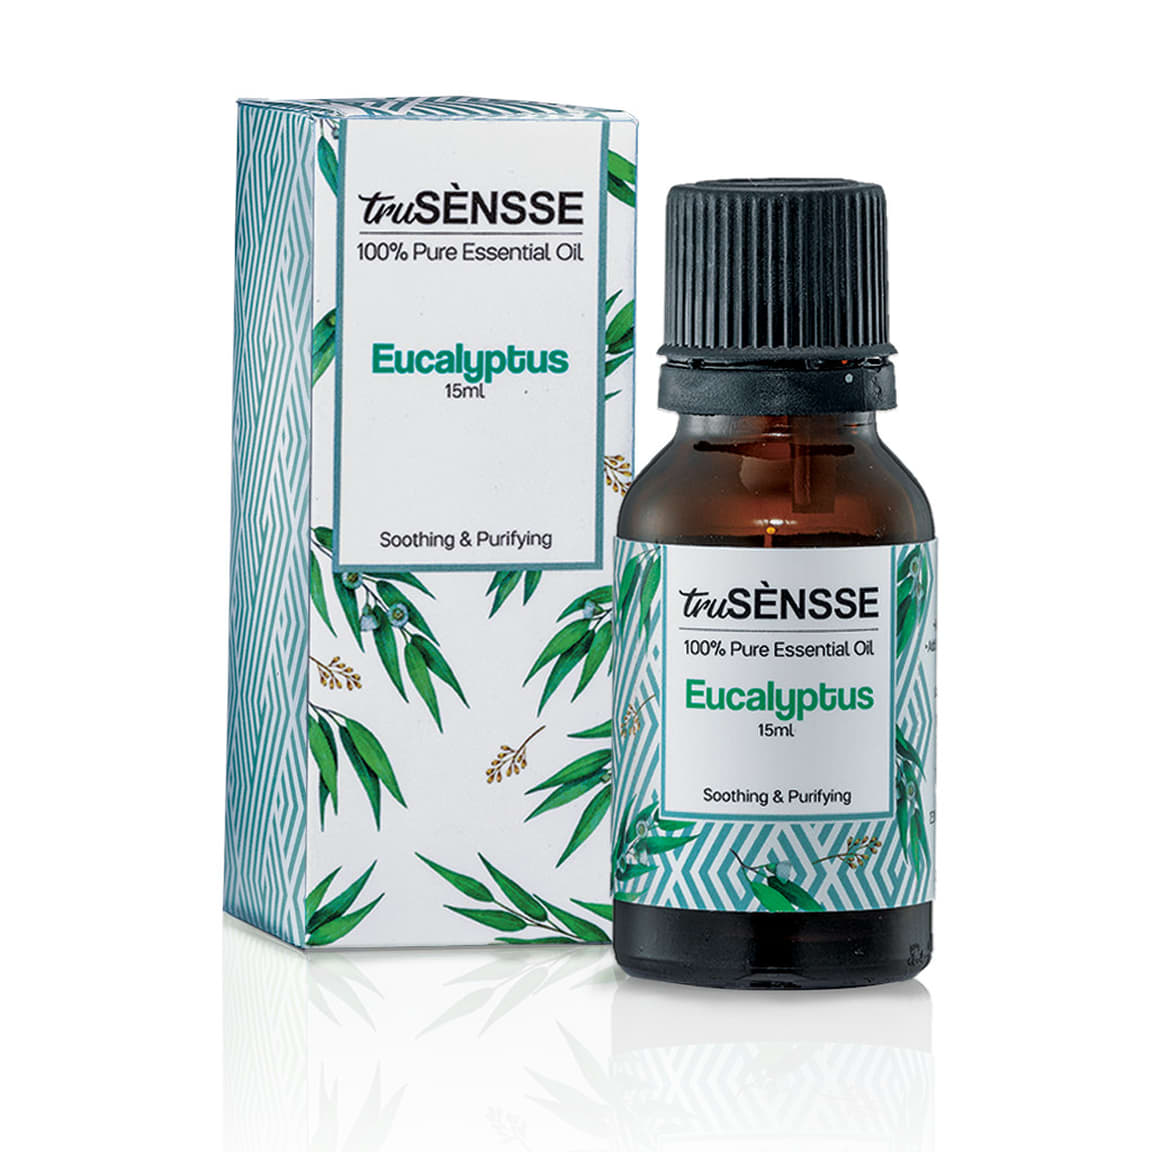 truSÈNSSE 100% Pure Essential Oil - Eucalyptus (1) 15ml